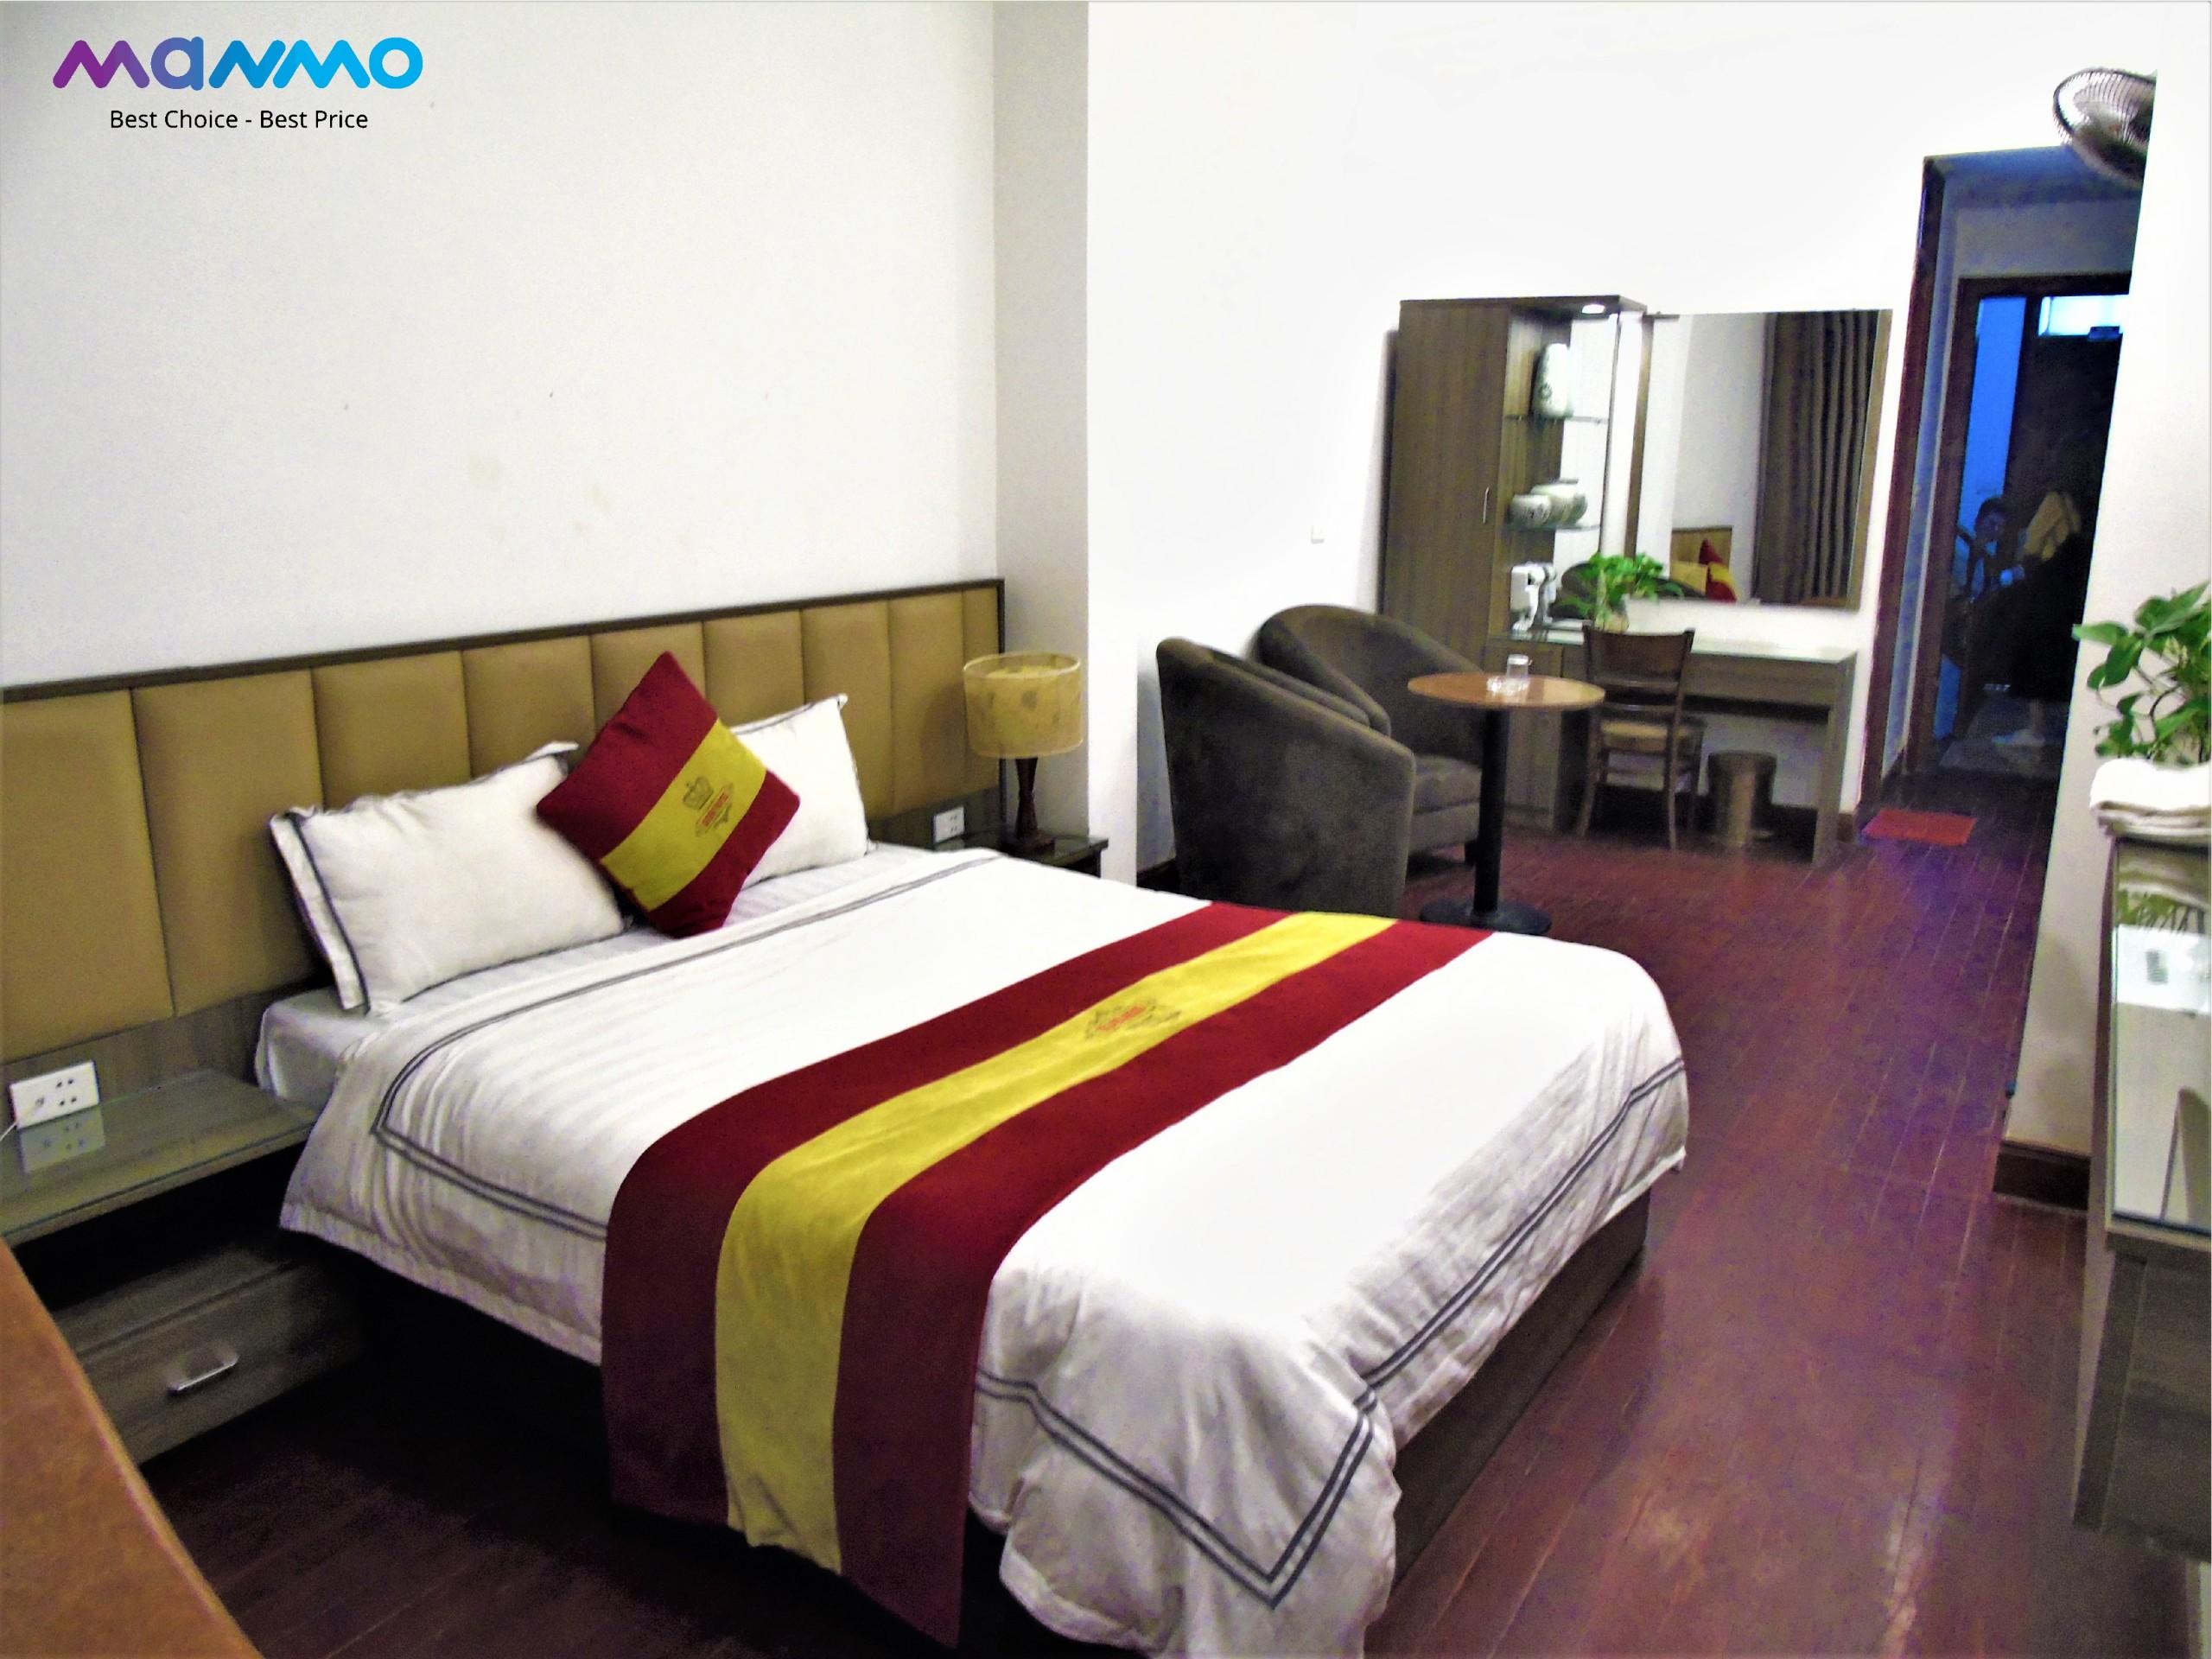 ManMo Queen Hotel